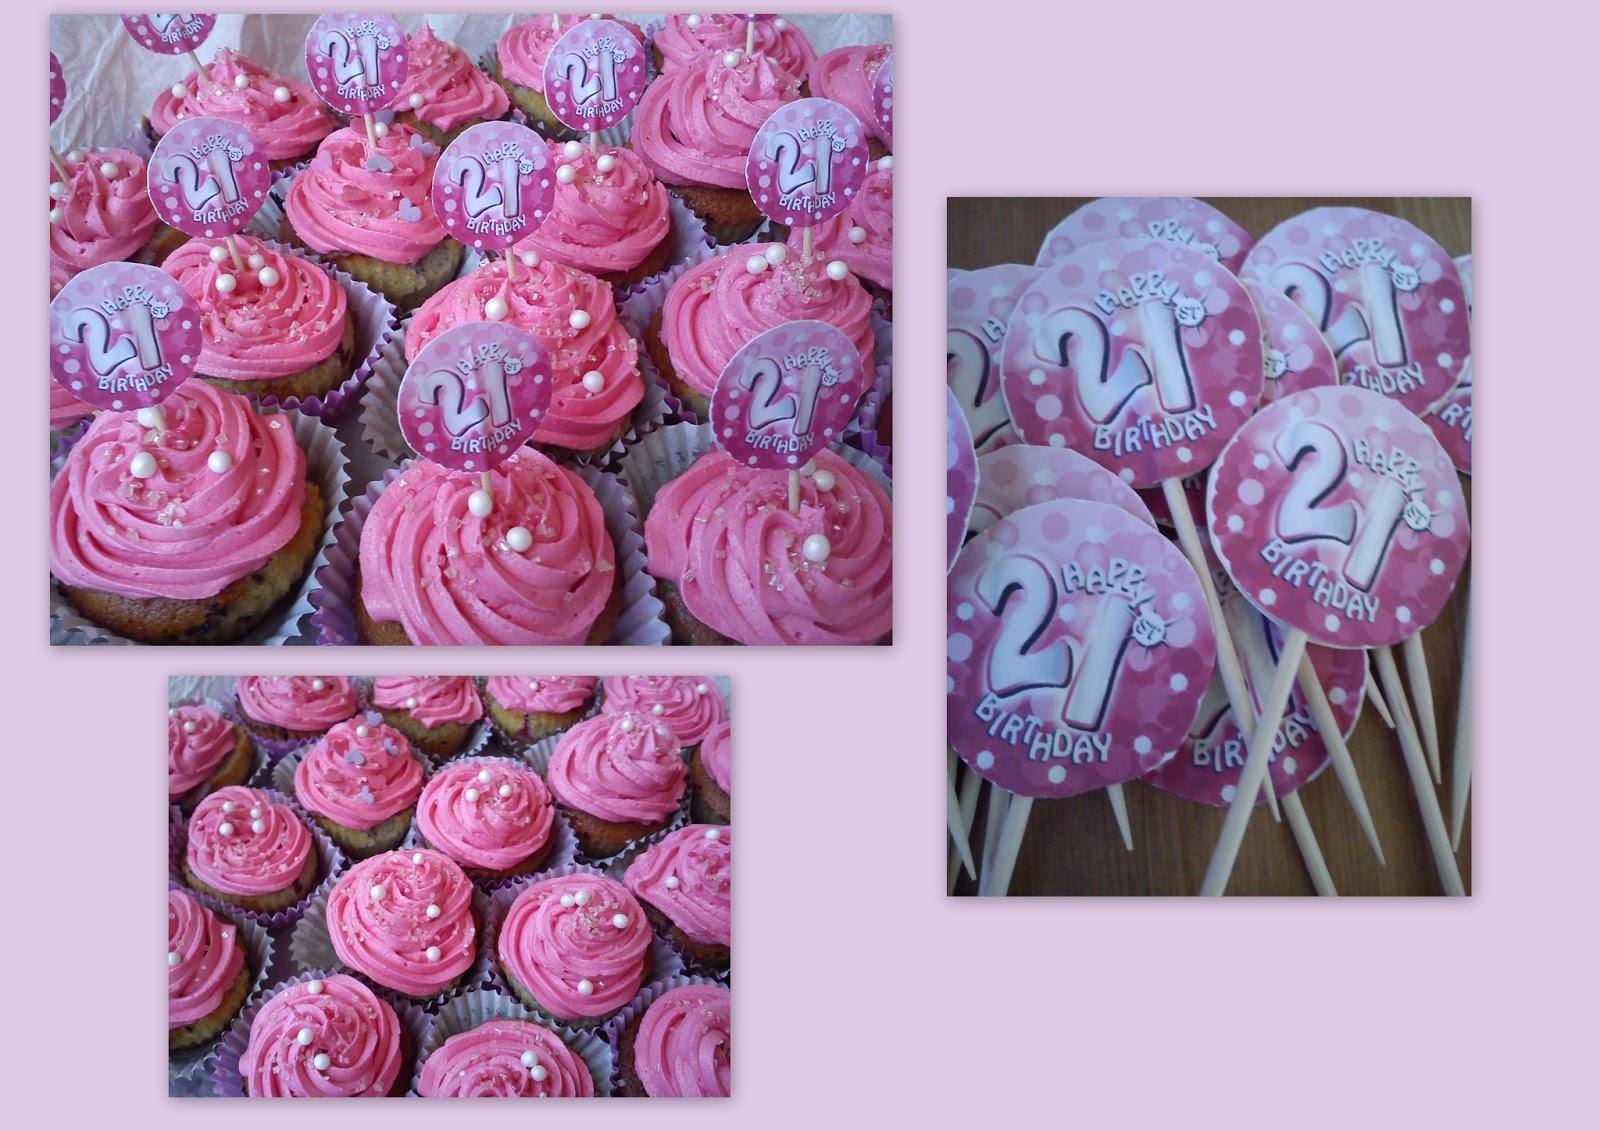 szülinapi muffinok Edit konyhája: Szülinapi muffinok szülinapi muffinok